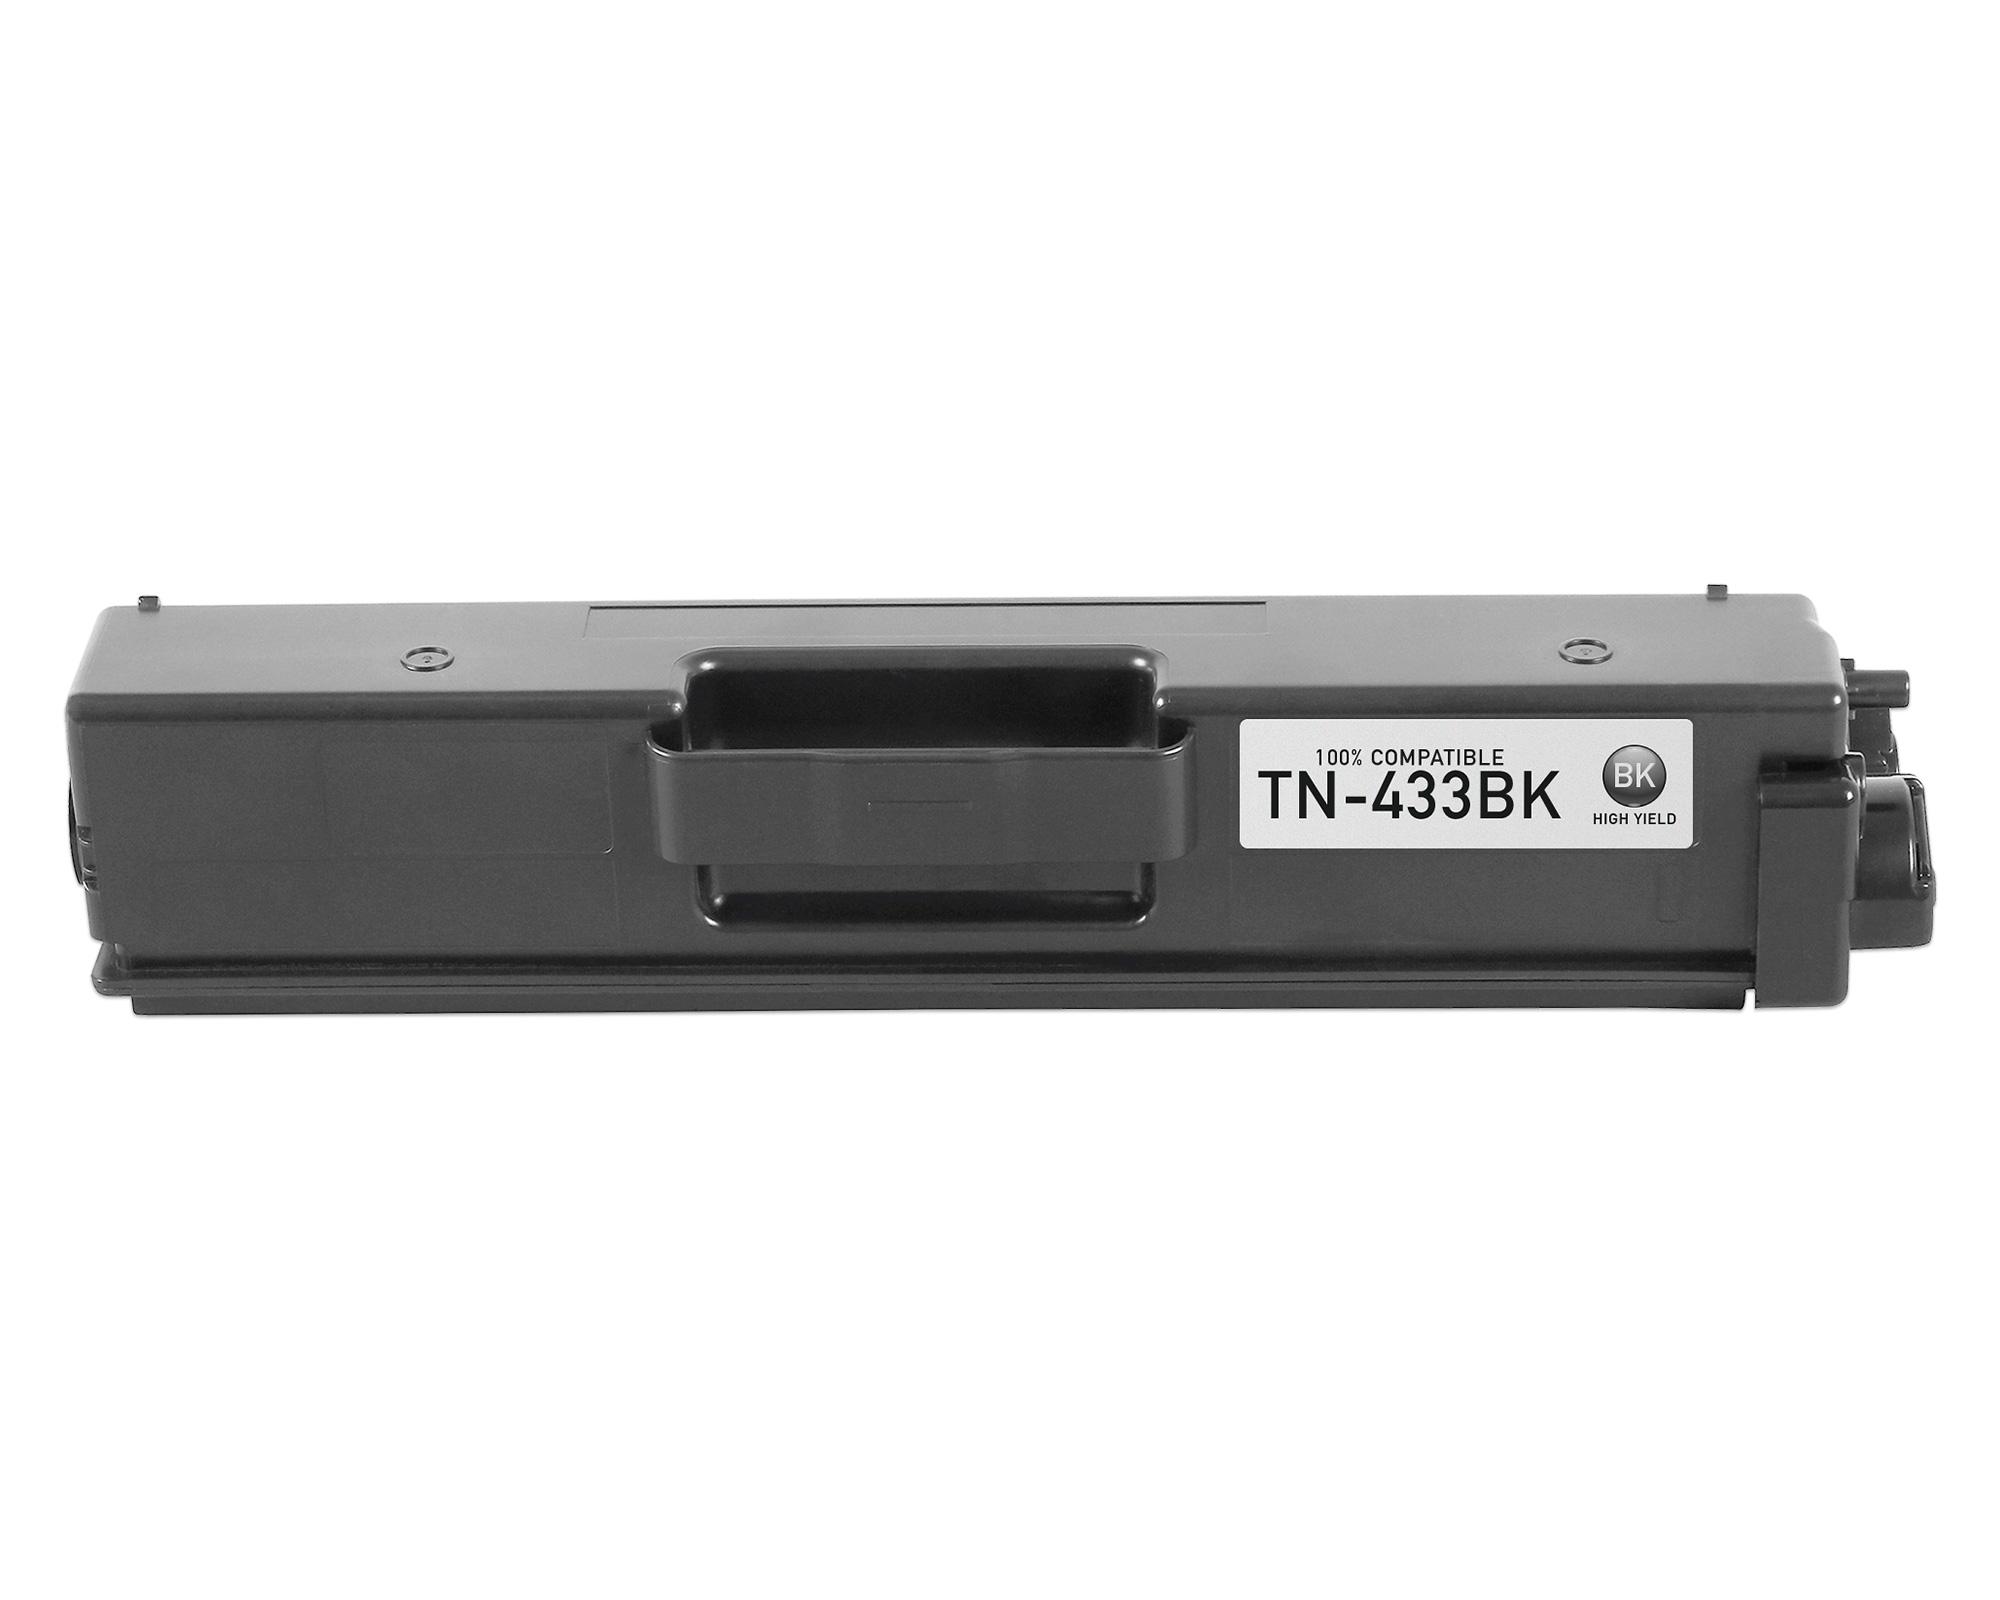 Generic Toner Black-Toner-Cartridge-High-Yield-Brother-MFC-L8900